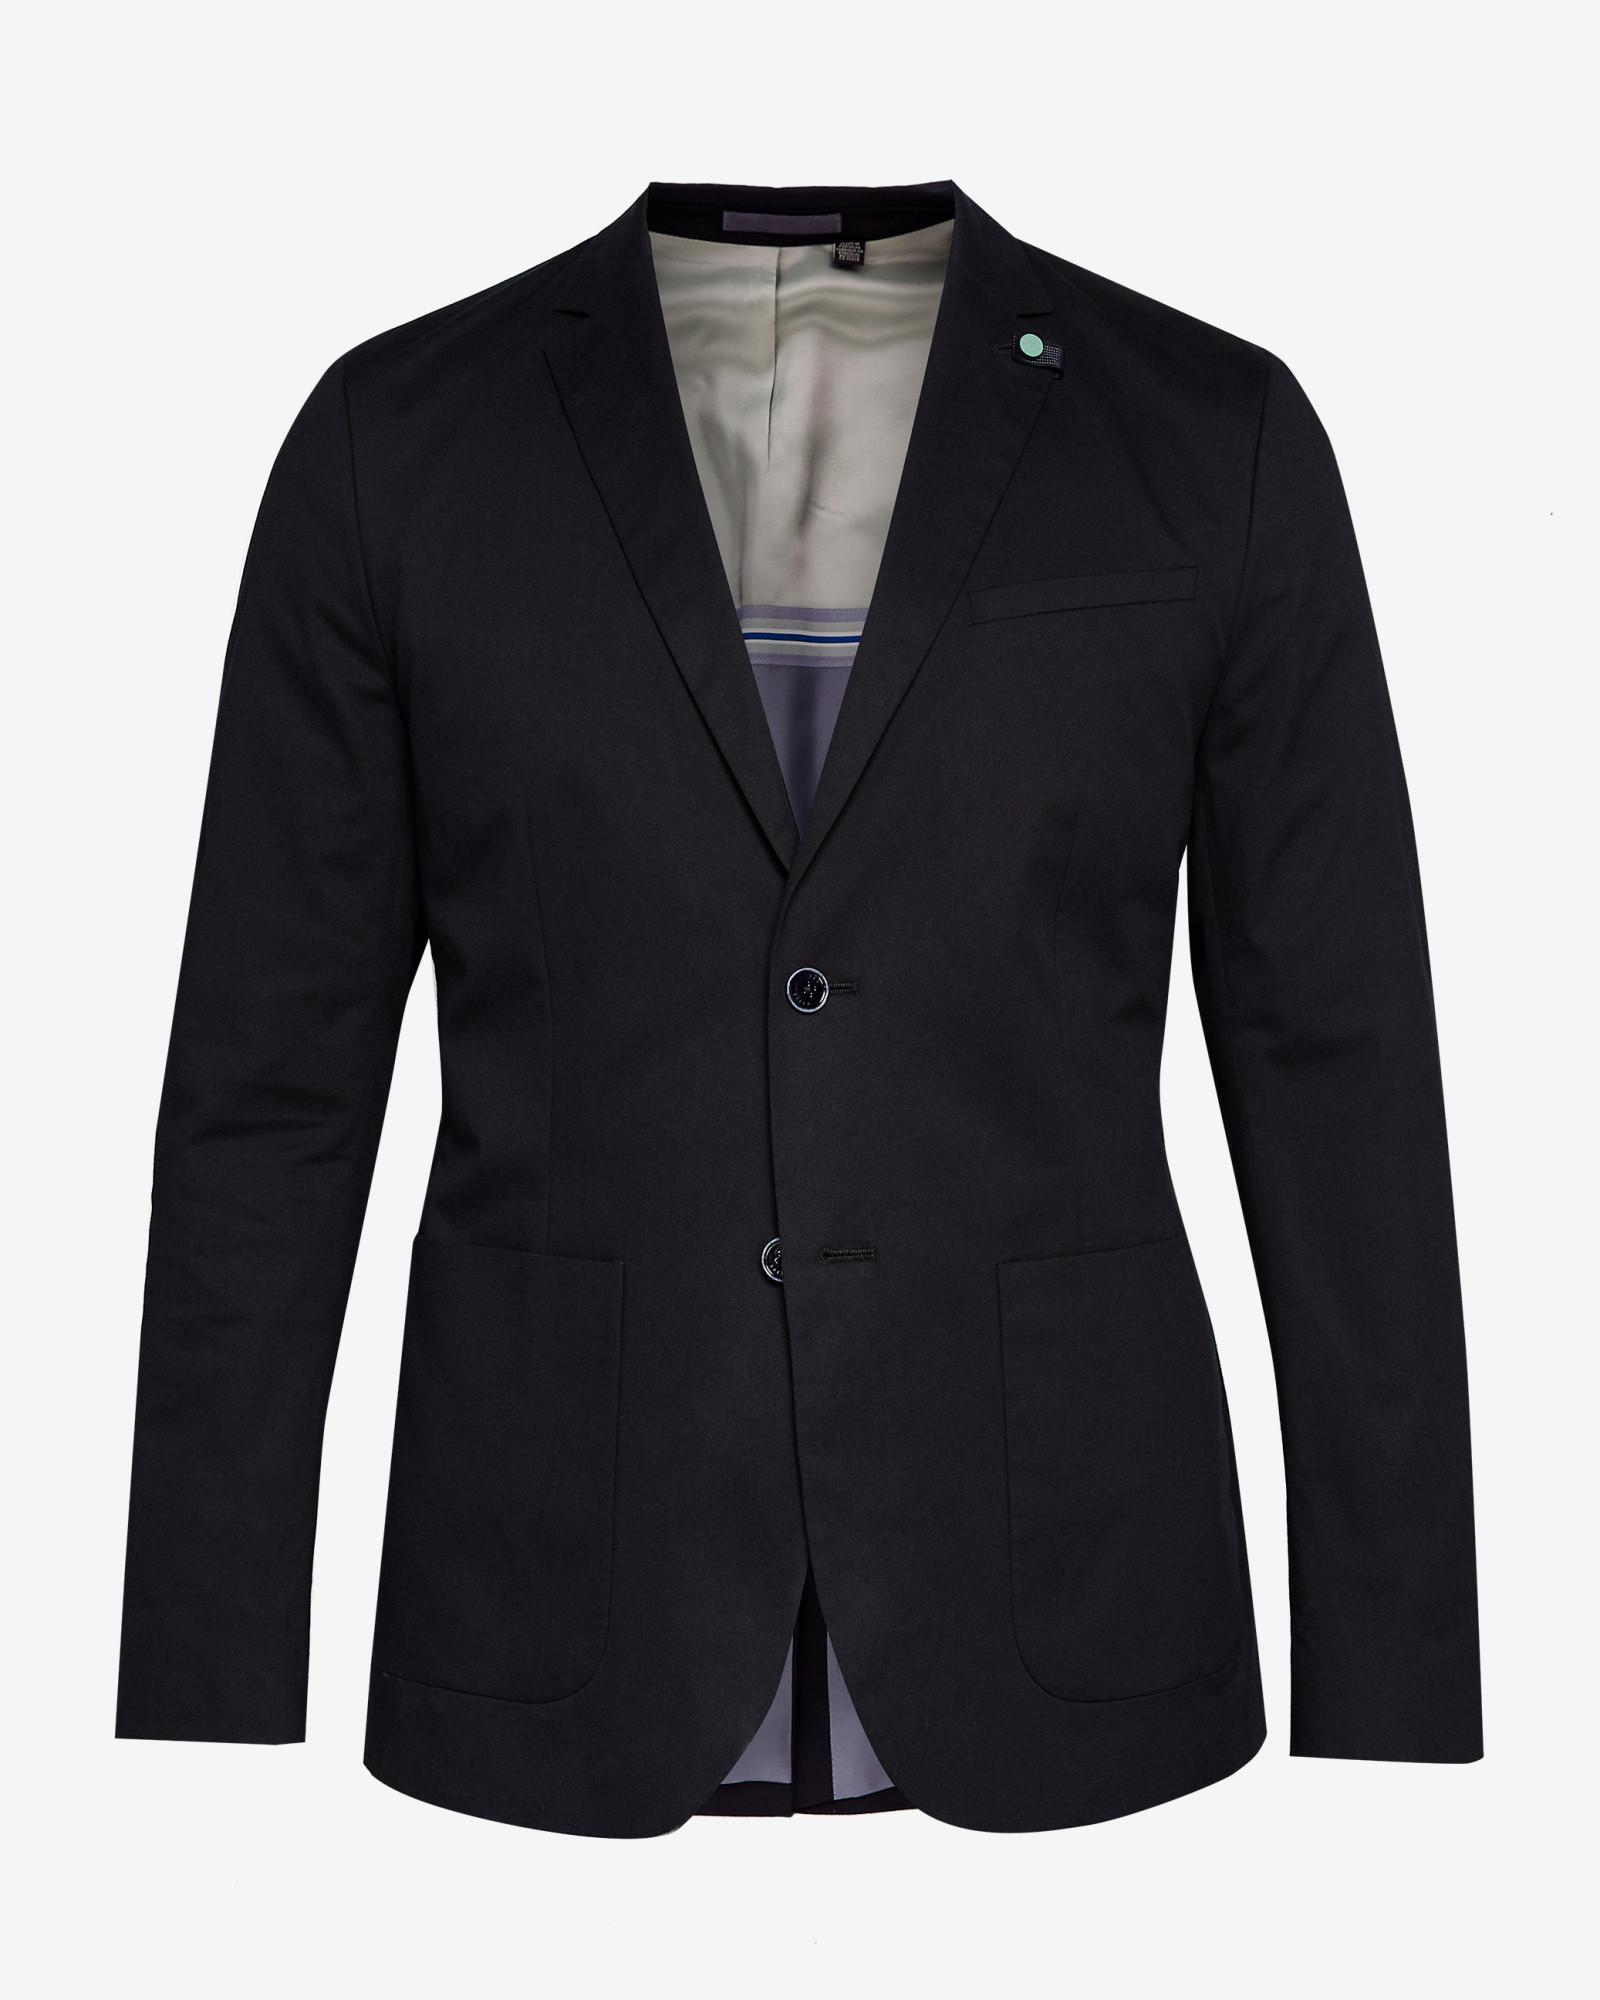 cf21125fc7b9 ... Piece-dyed Cotton Blazer for Men - Lyst. View fullscreen